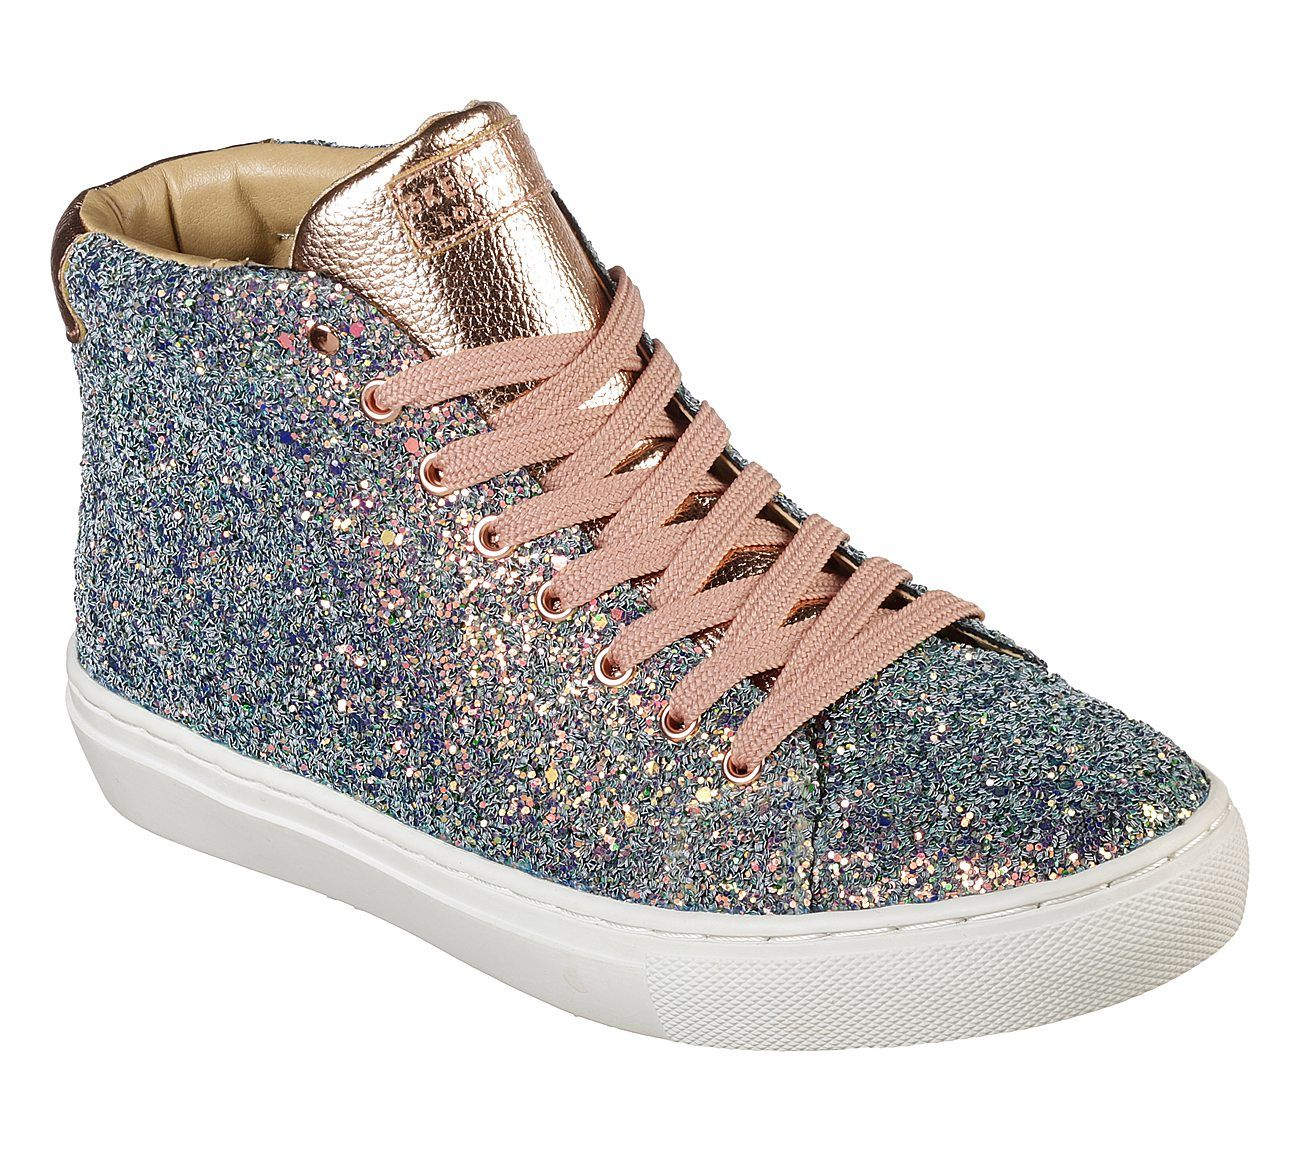 26d429d4d Buy SKECHERS Side Street - Night Life SKECHER Street Shoes only $65.00